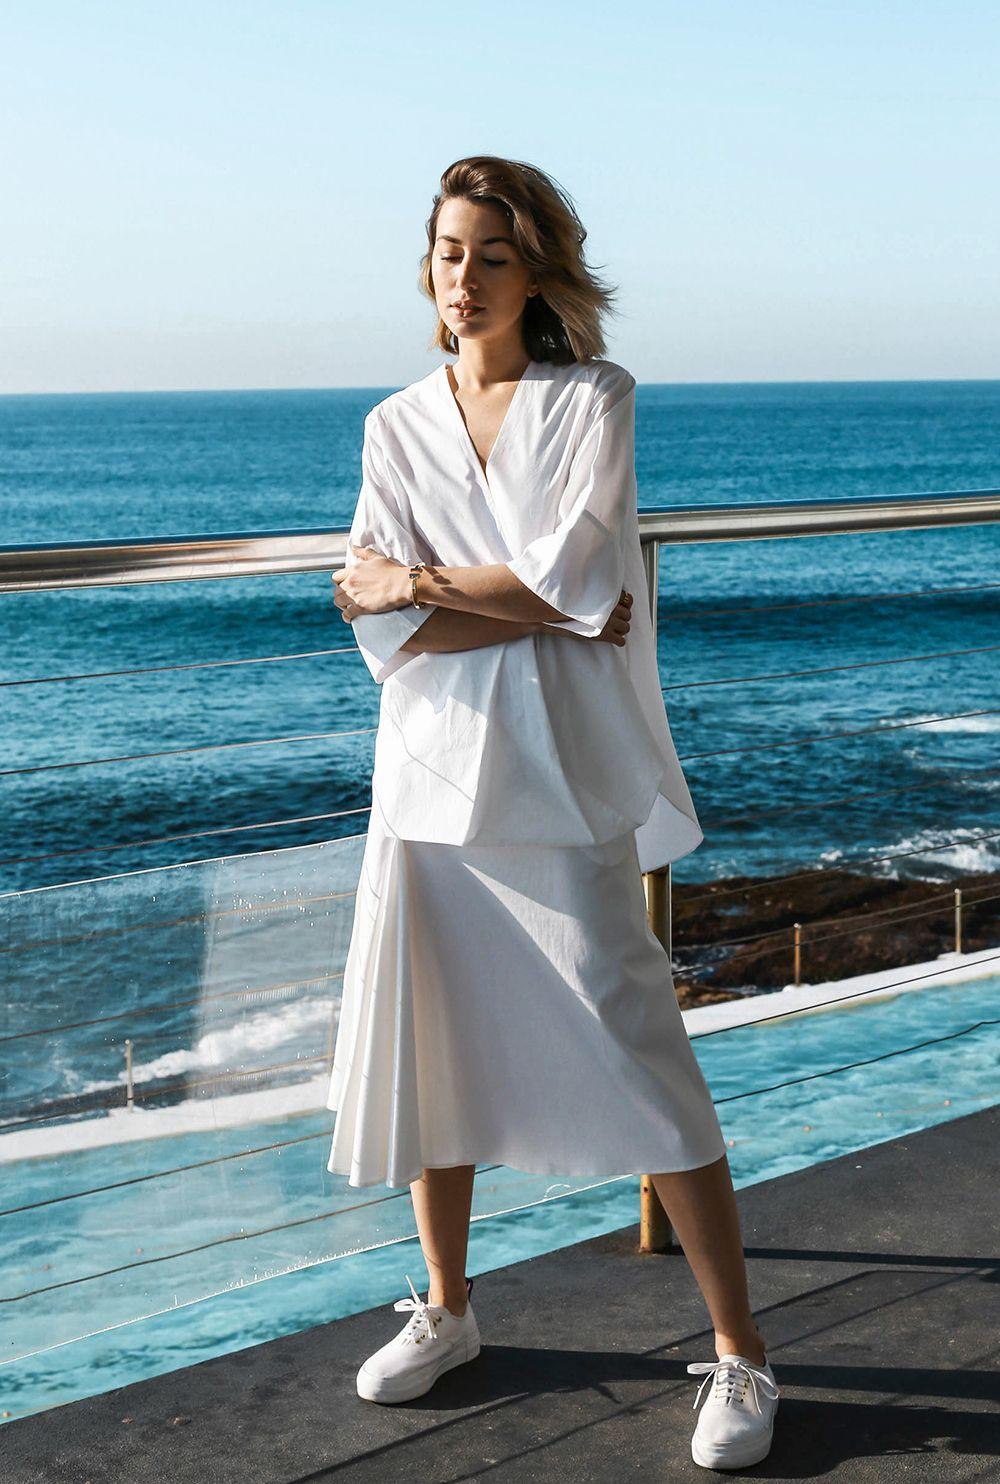 Style Spy: Summer Whites